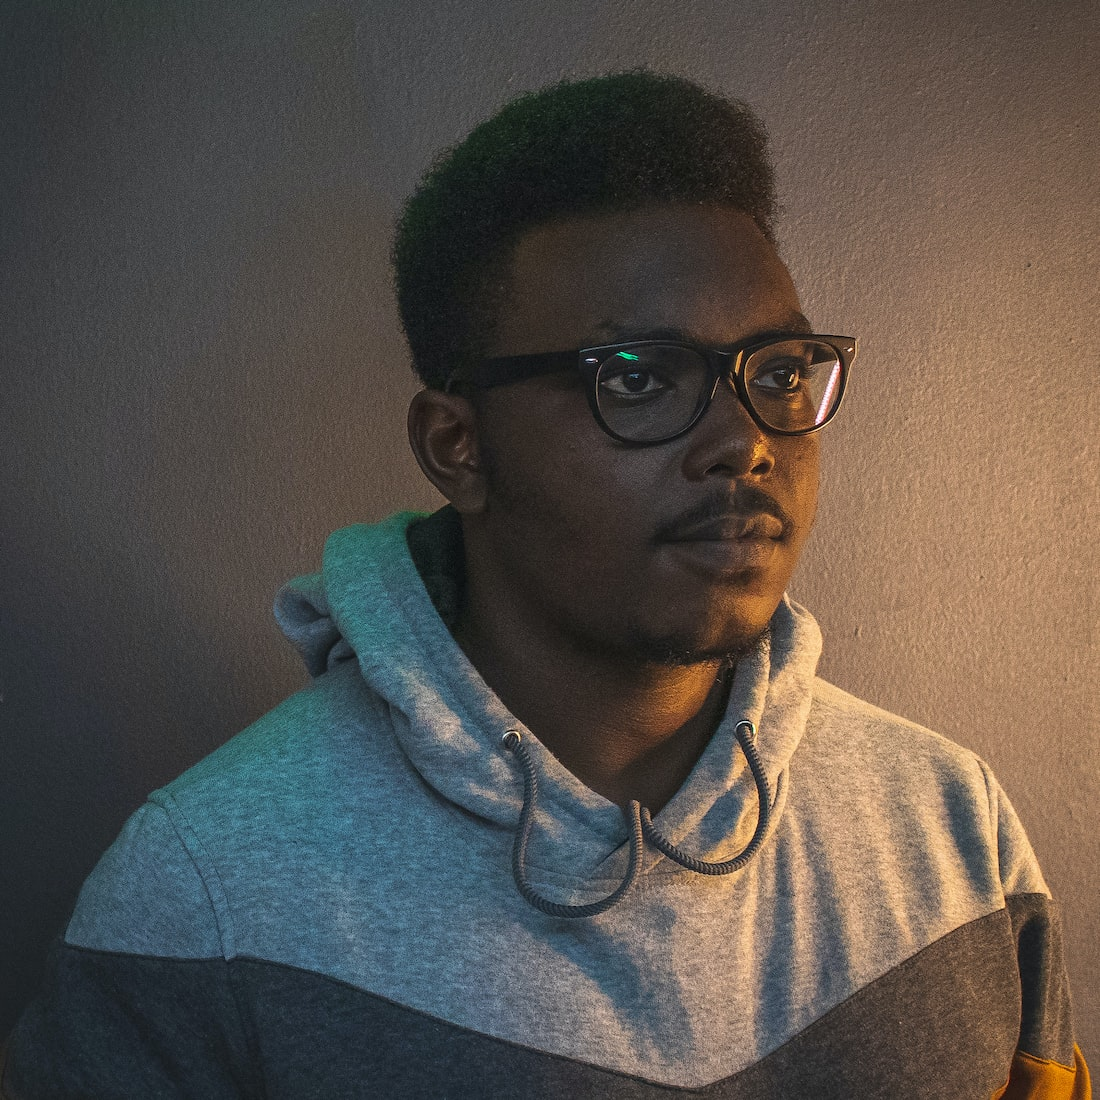 Go to Joshua Oluwagbemiga's profile